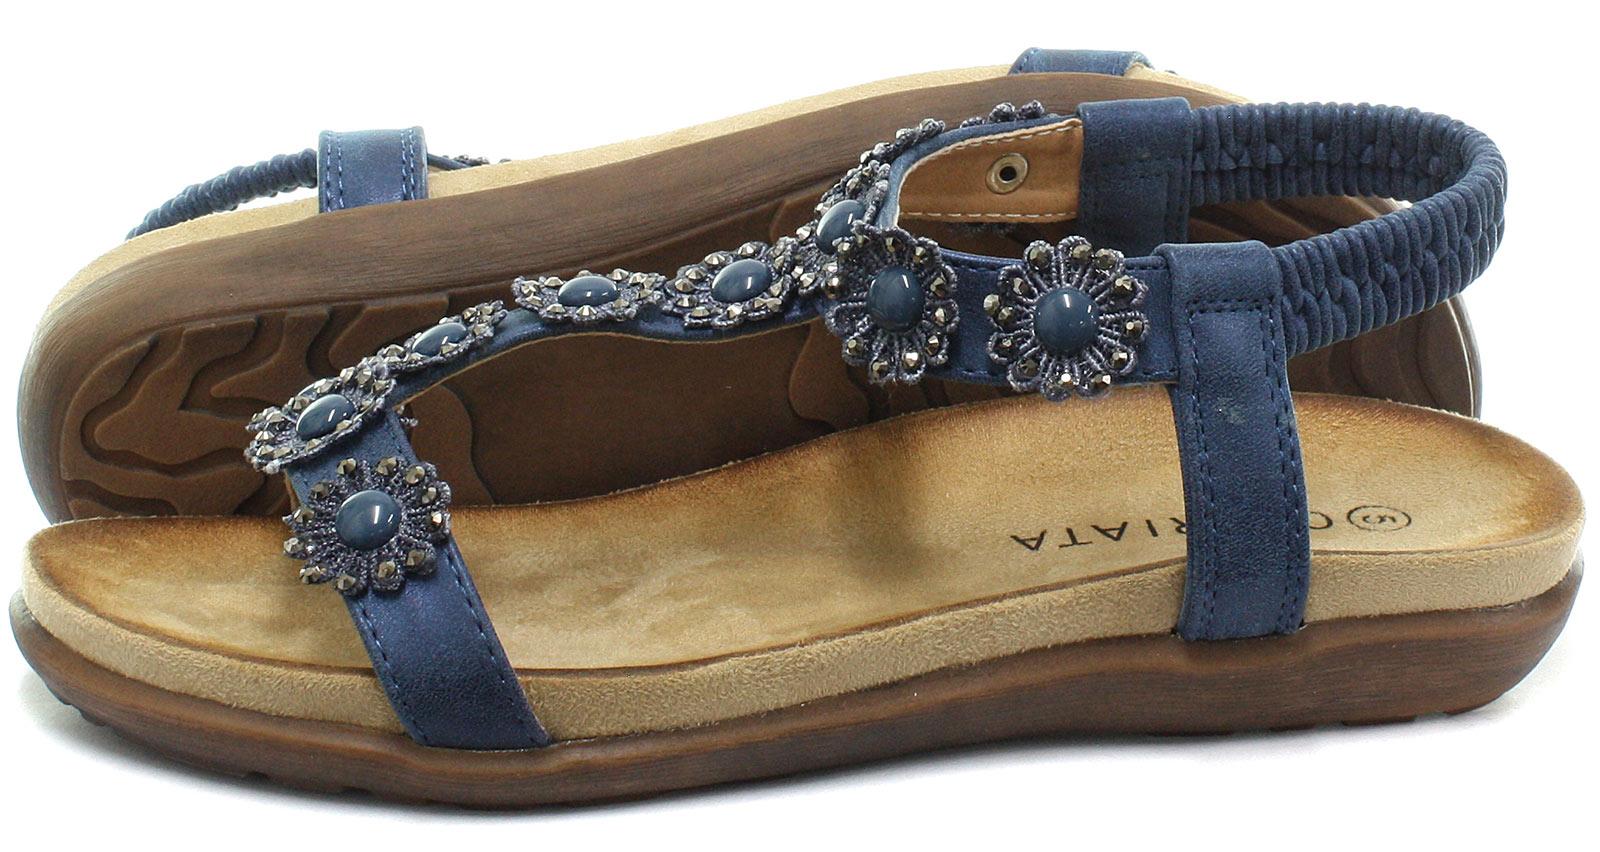 New-Cipriata-Giovanna-Navy-Flower-Womens-Halter-Back-Sandals-ALL-SIZES miniature 3